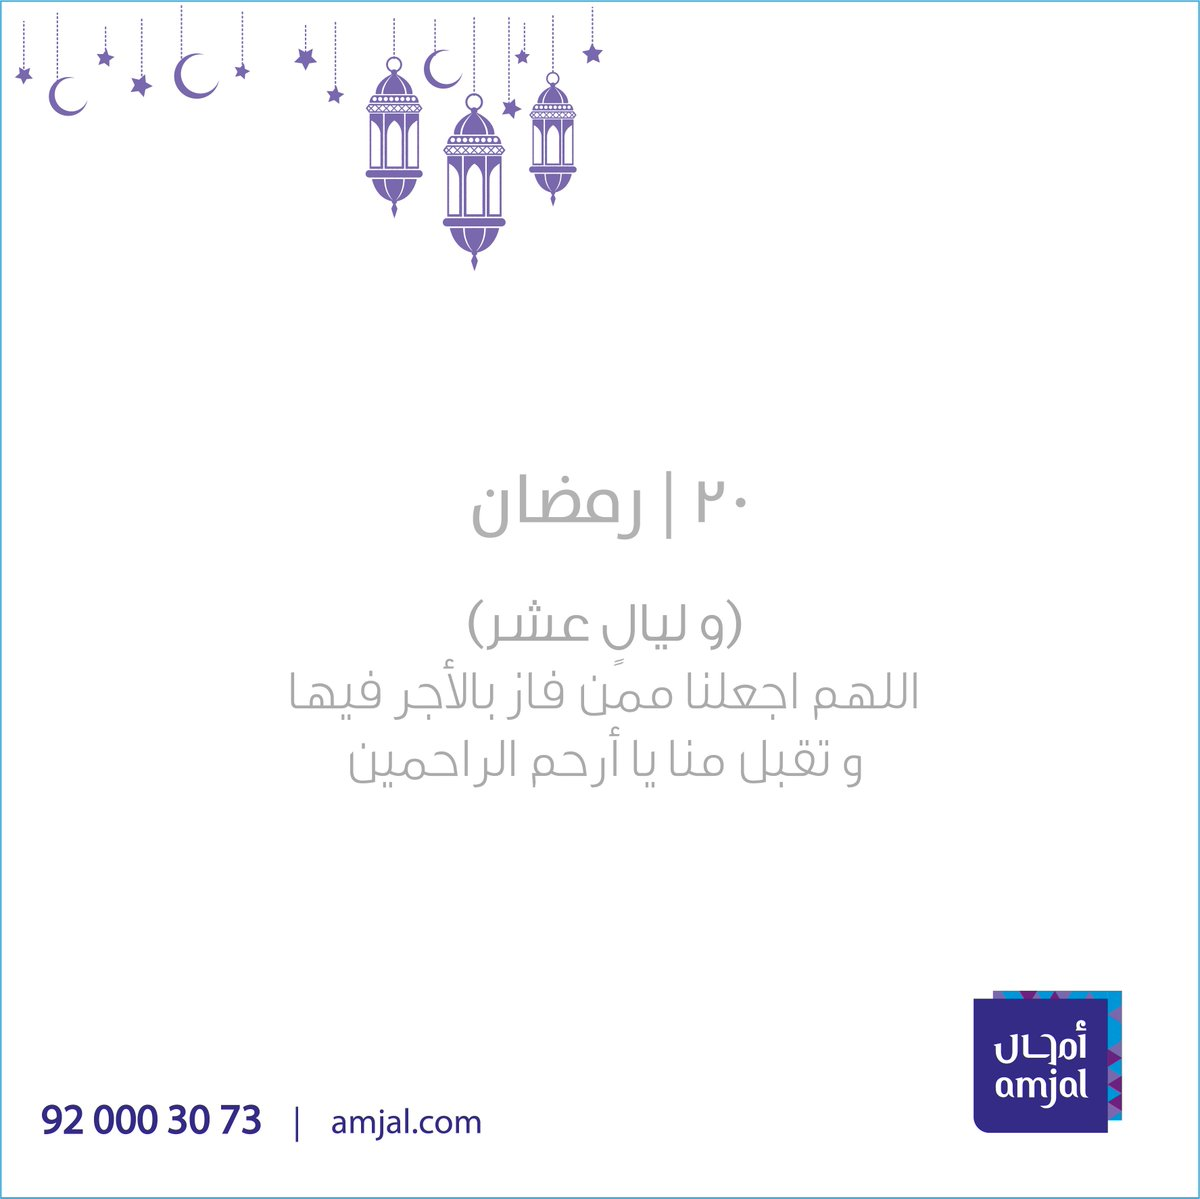 #دعاء_رمضان https://t.co/KCN3LMPSxd